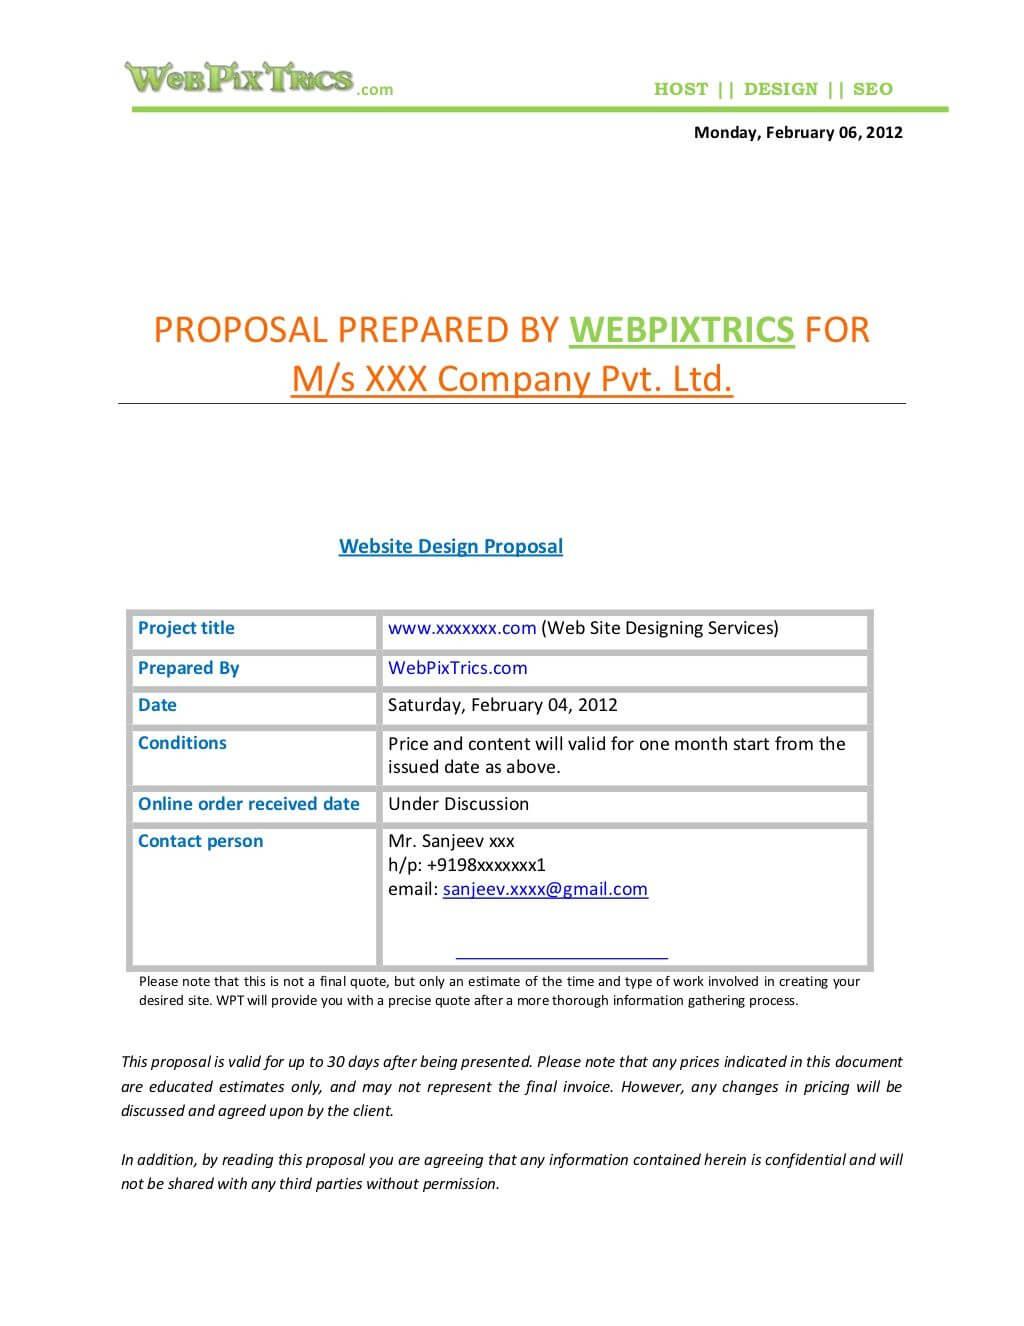 Web Design Proposal Samplewebpixtrics  Via With Regard To Web Design Quote Template Word